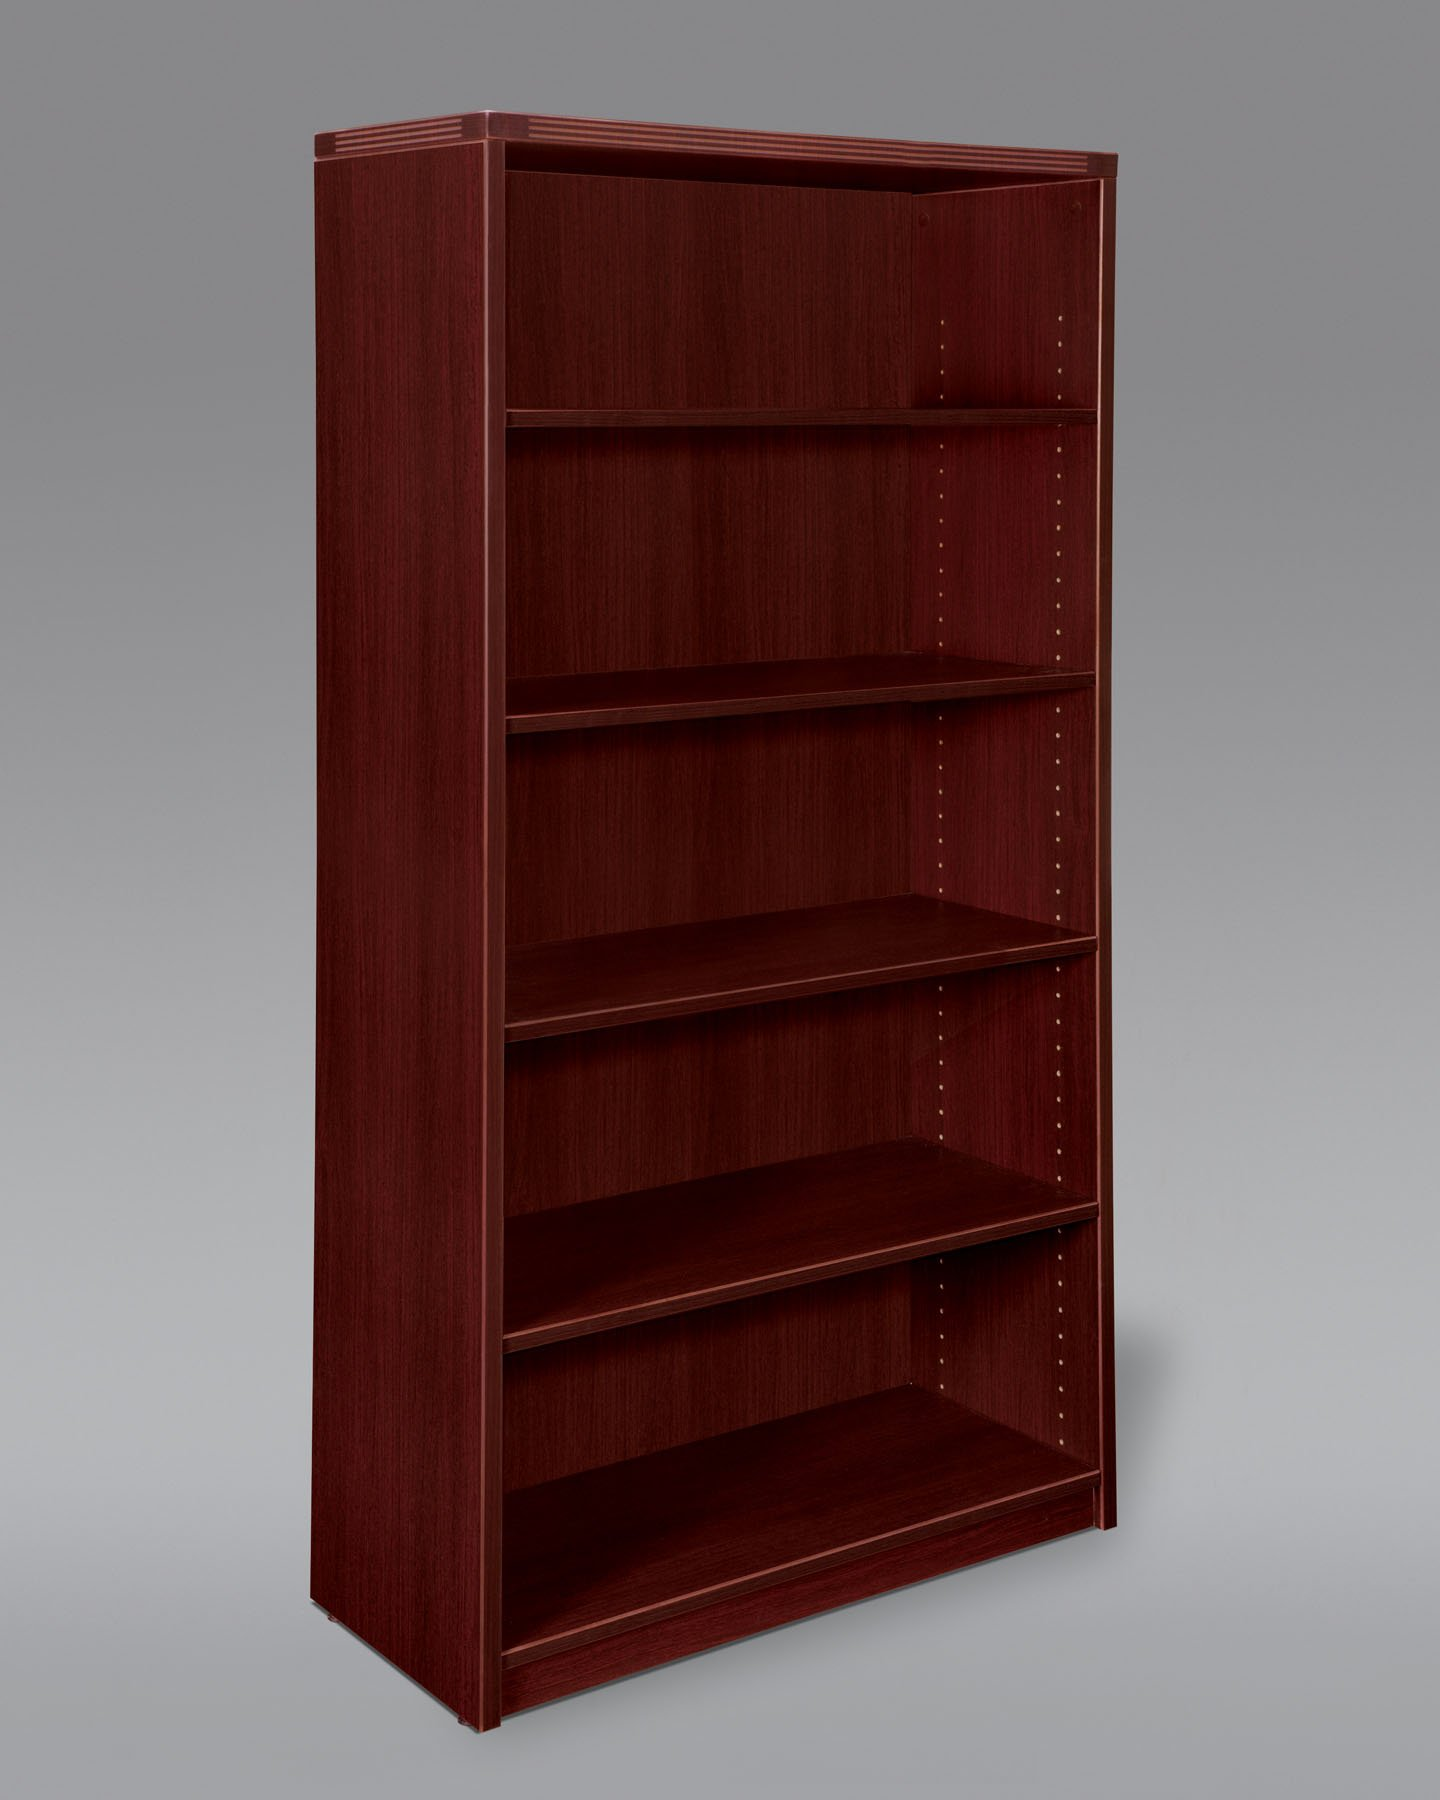 Flexsteel Fairplex  Bookcase